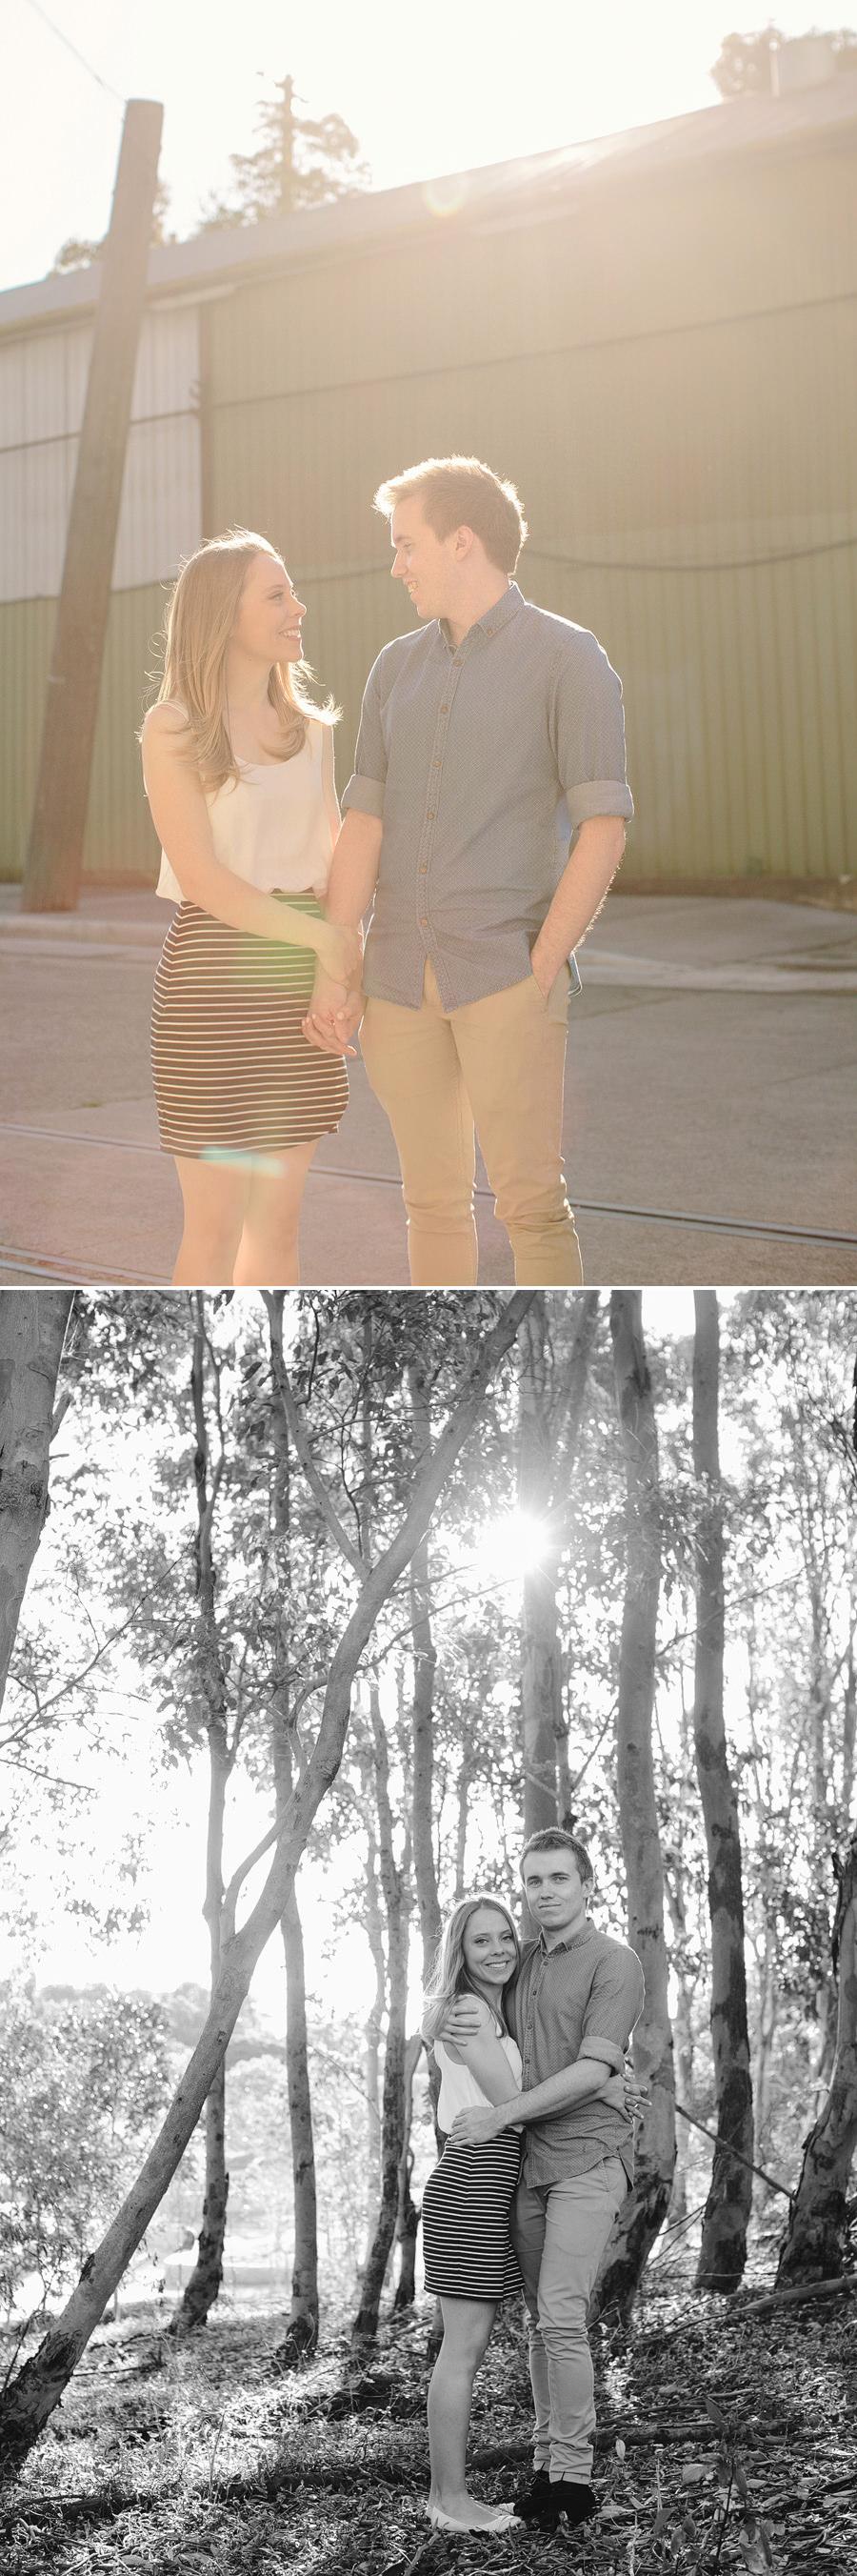 Sydney Park Engagement Photographer: Kristyn & Shaun